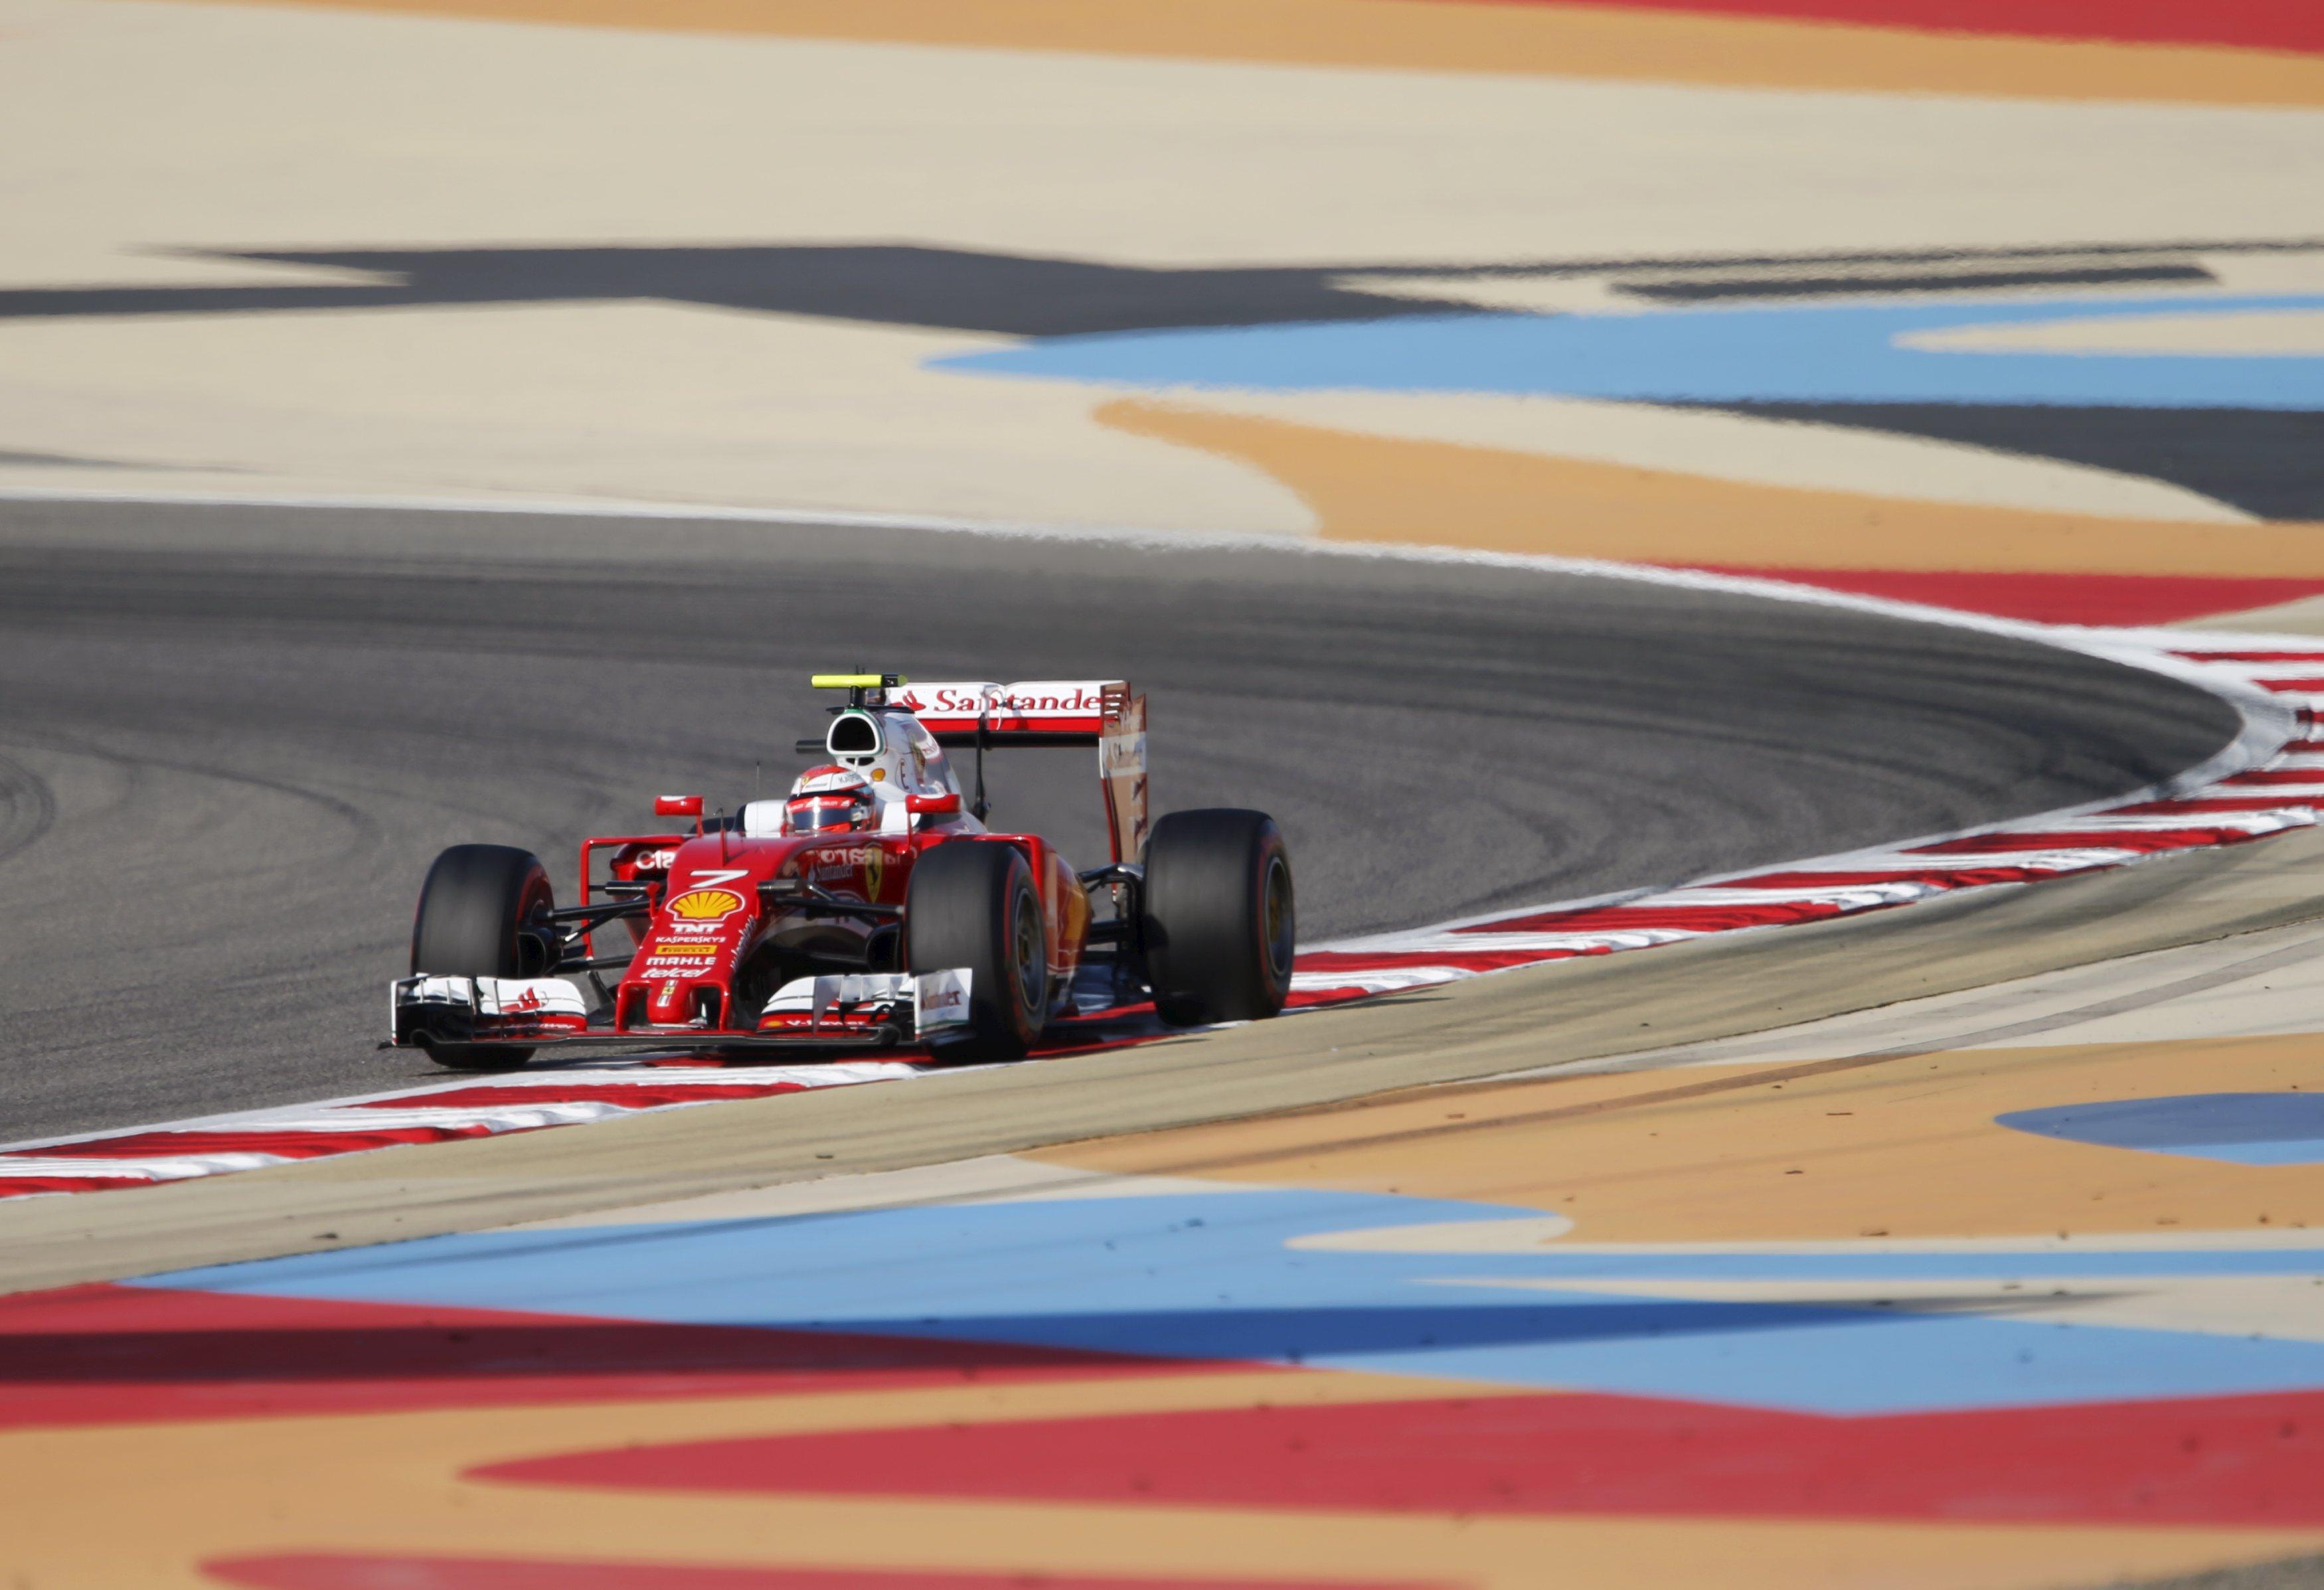 Ferrari ramps up Mercedes challenge, finish final practice on top